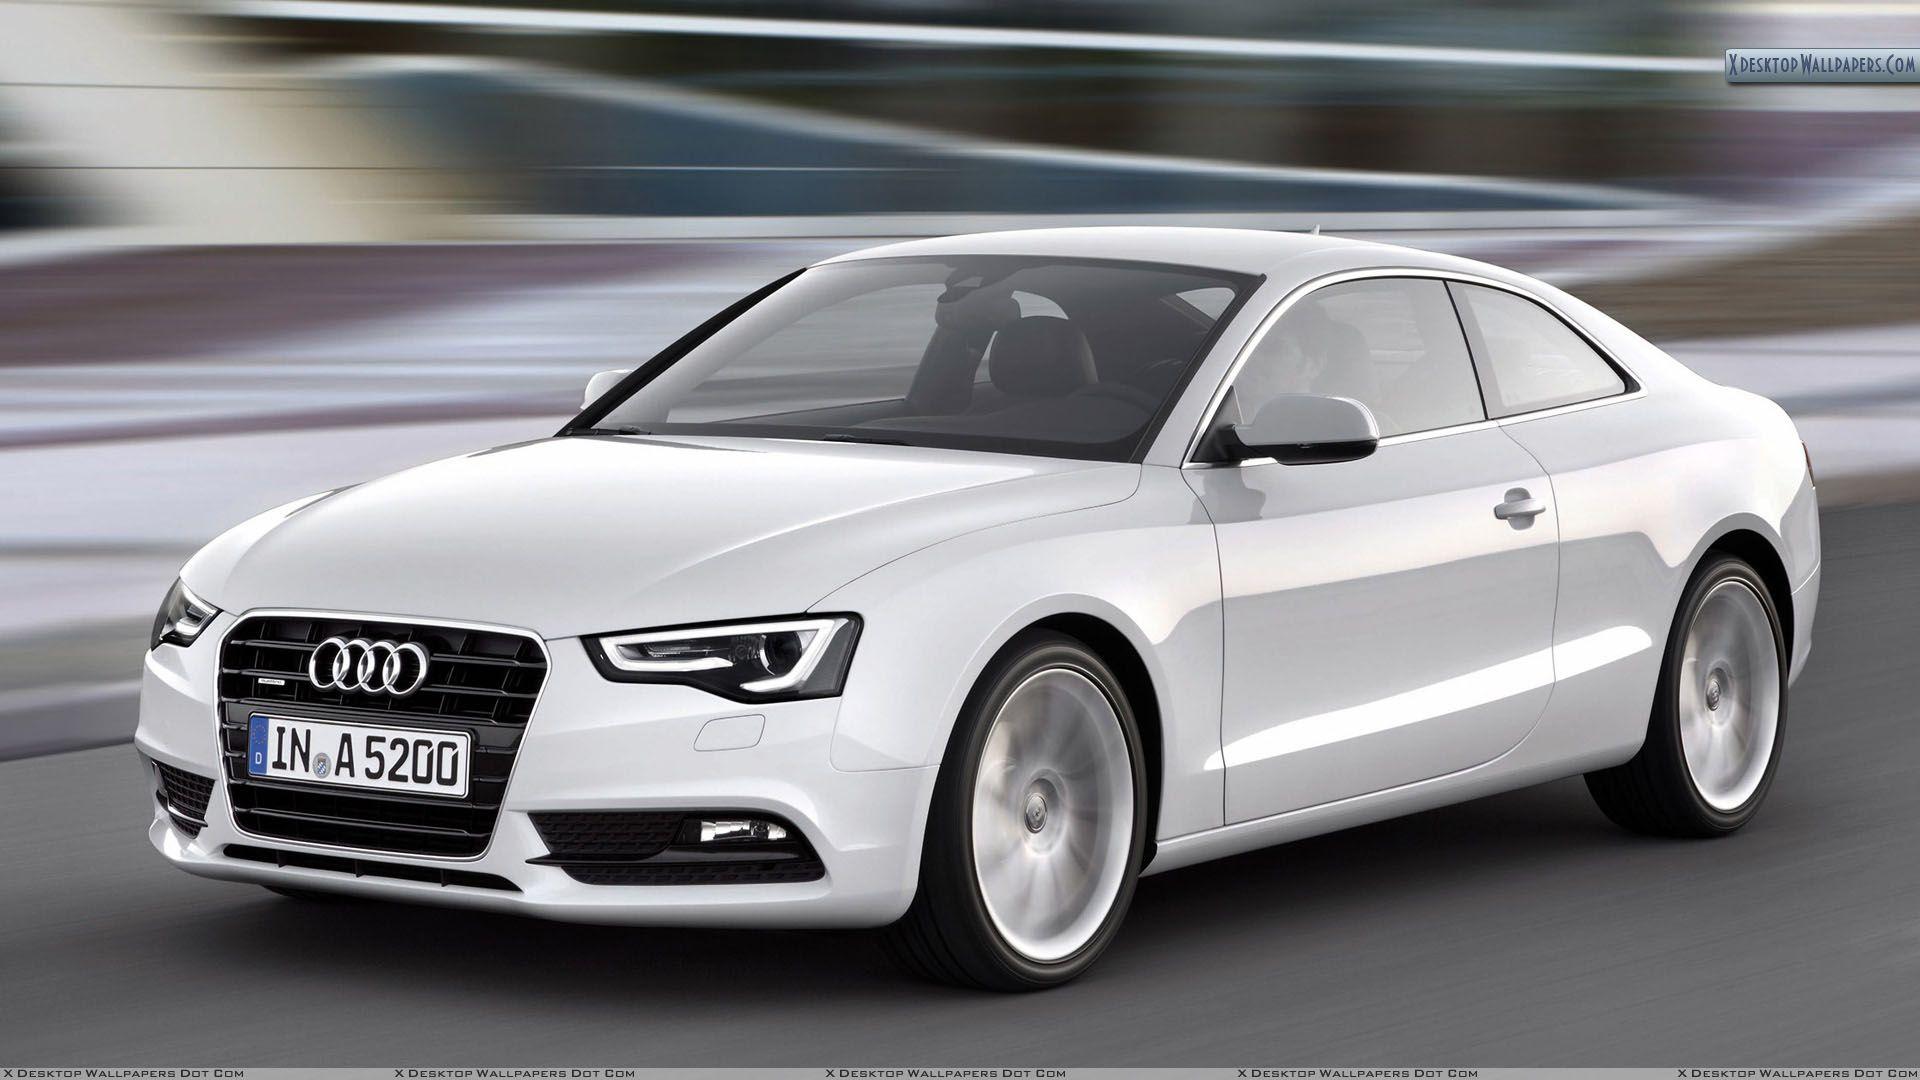 Audi A5 Coupe White MINE MINE MINE MINE MINE shaq